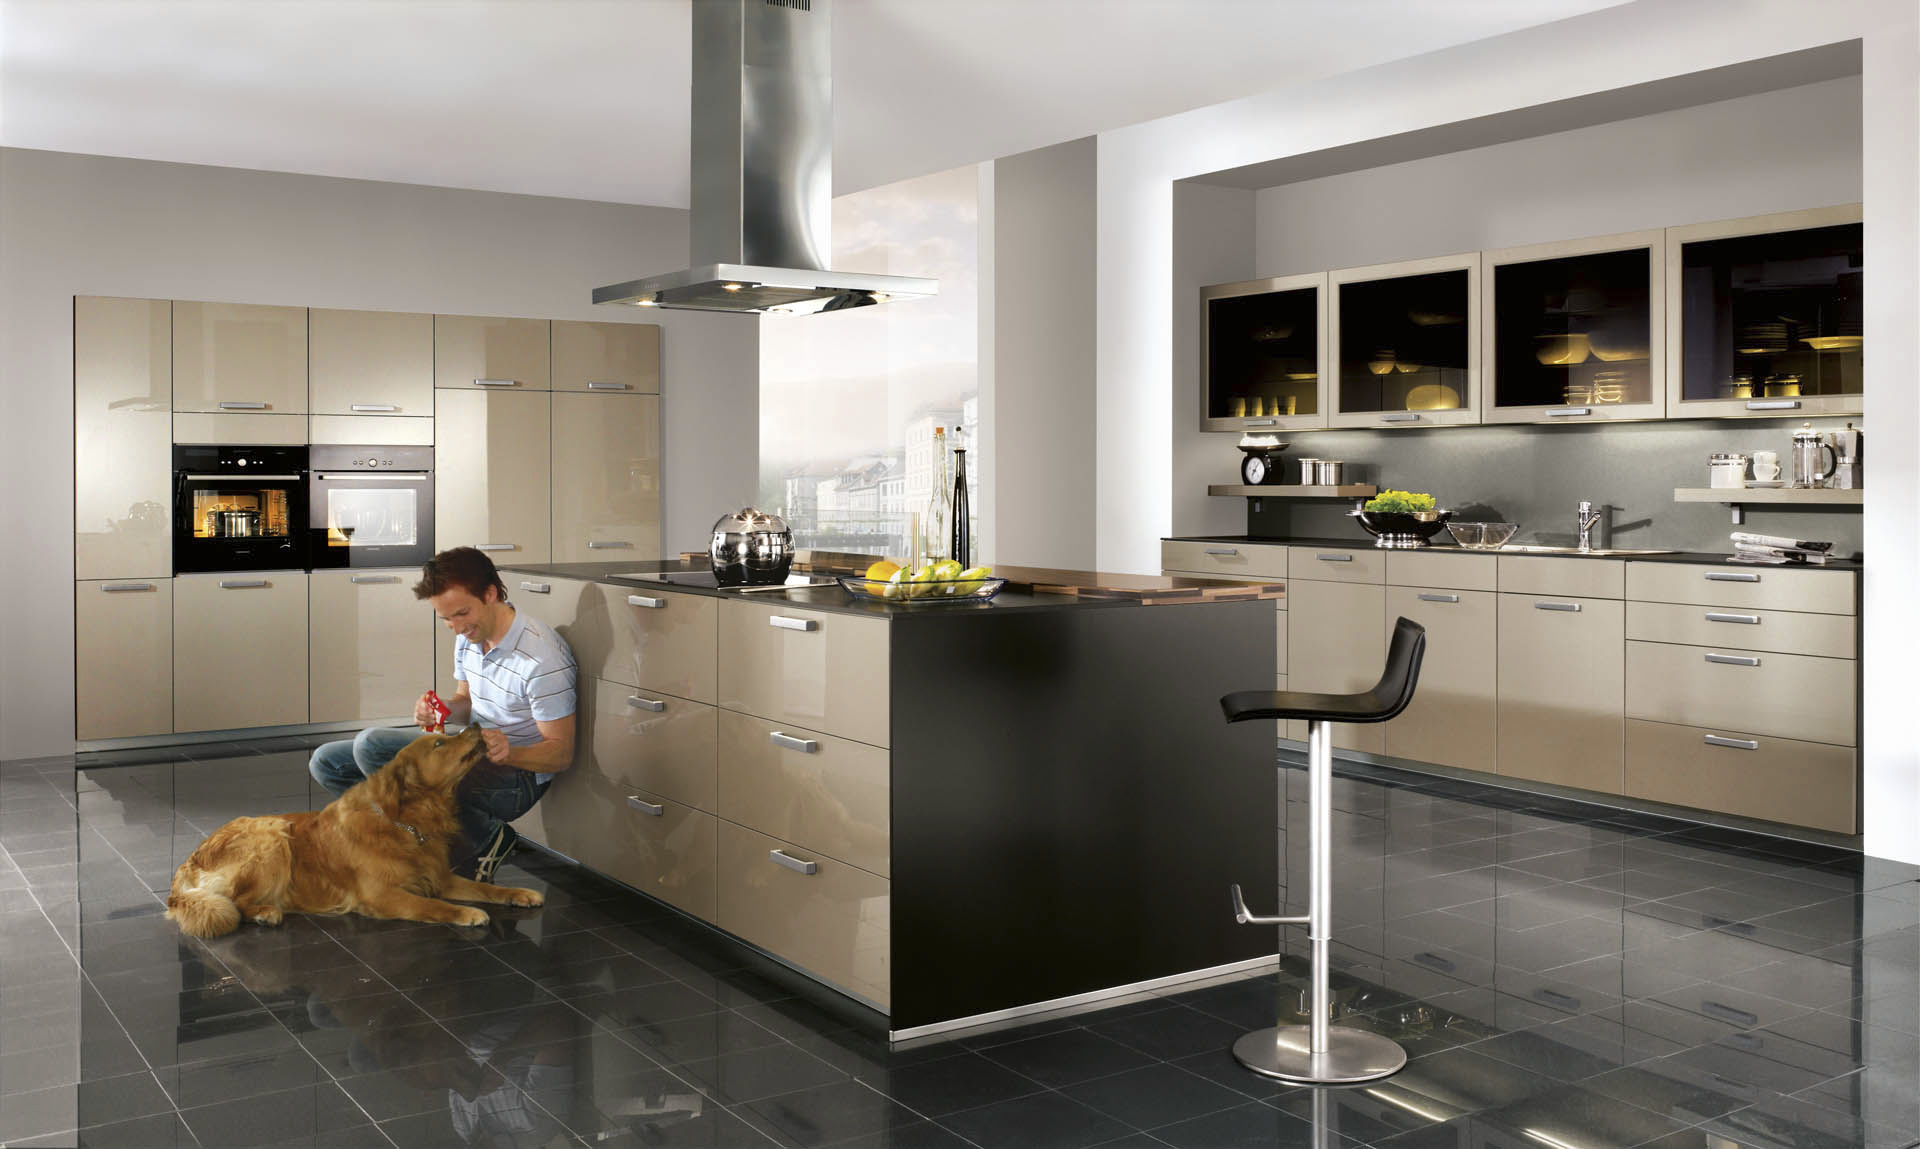 #A69525 Cocina Isla Conceptos B Sicos De Dise O 5ways2win.com 1920x1149 px Imagens De Kitchen Units_256 Imagens